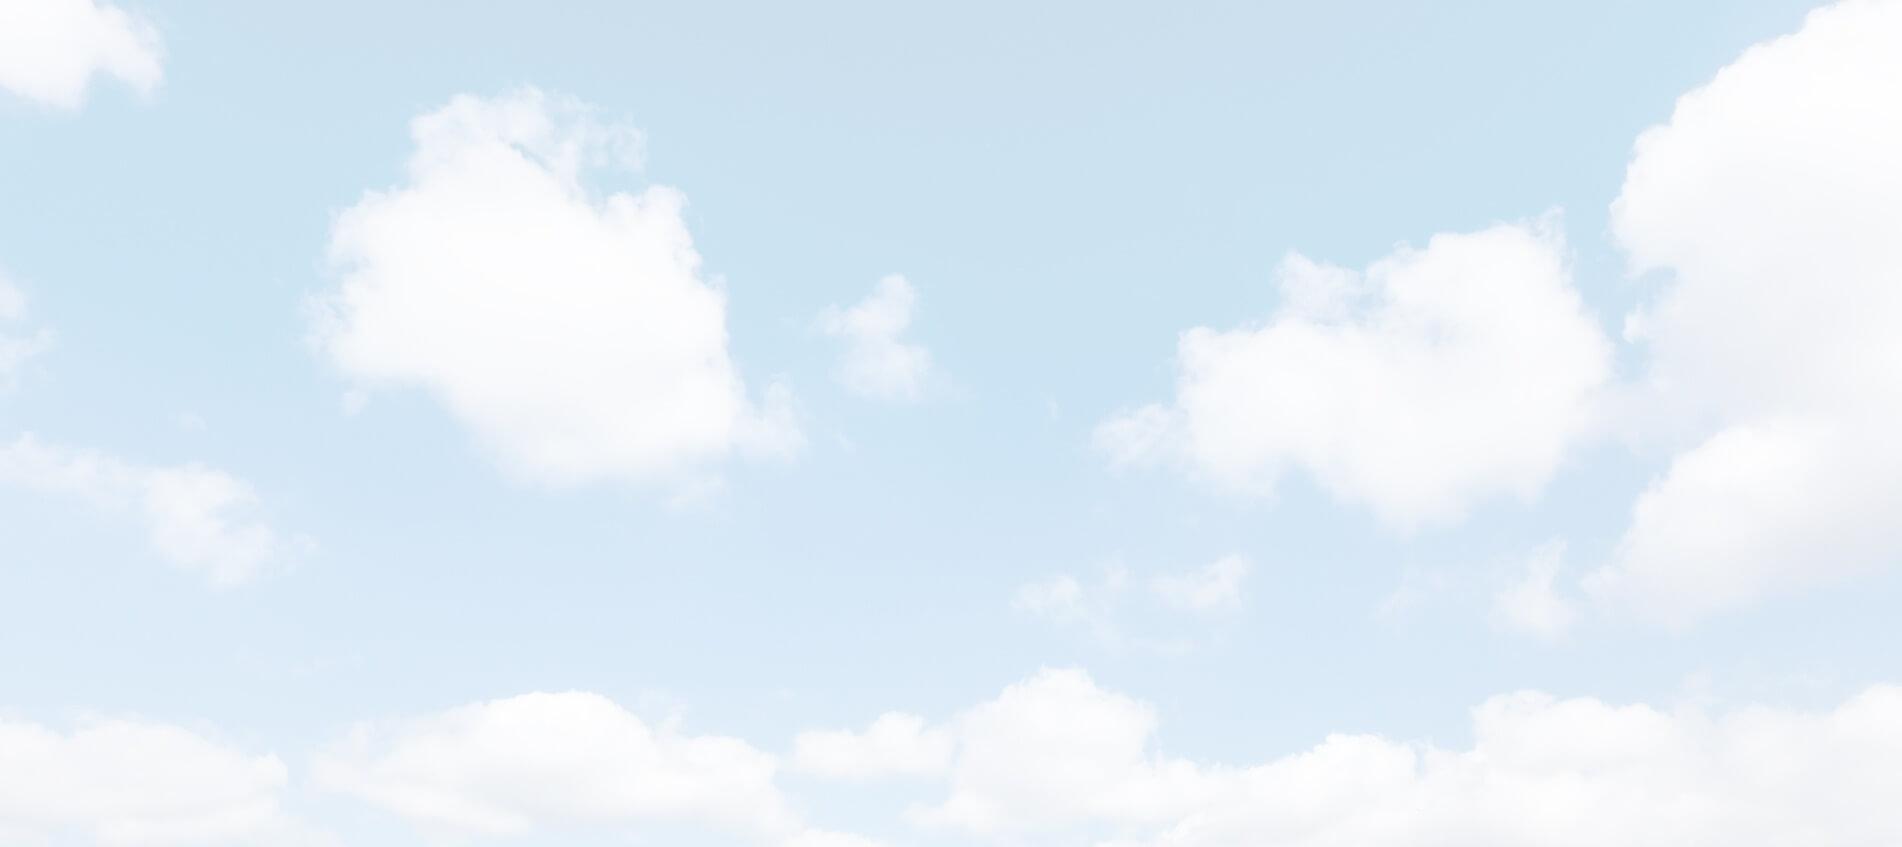 sky-bg-1